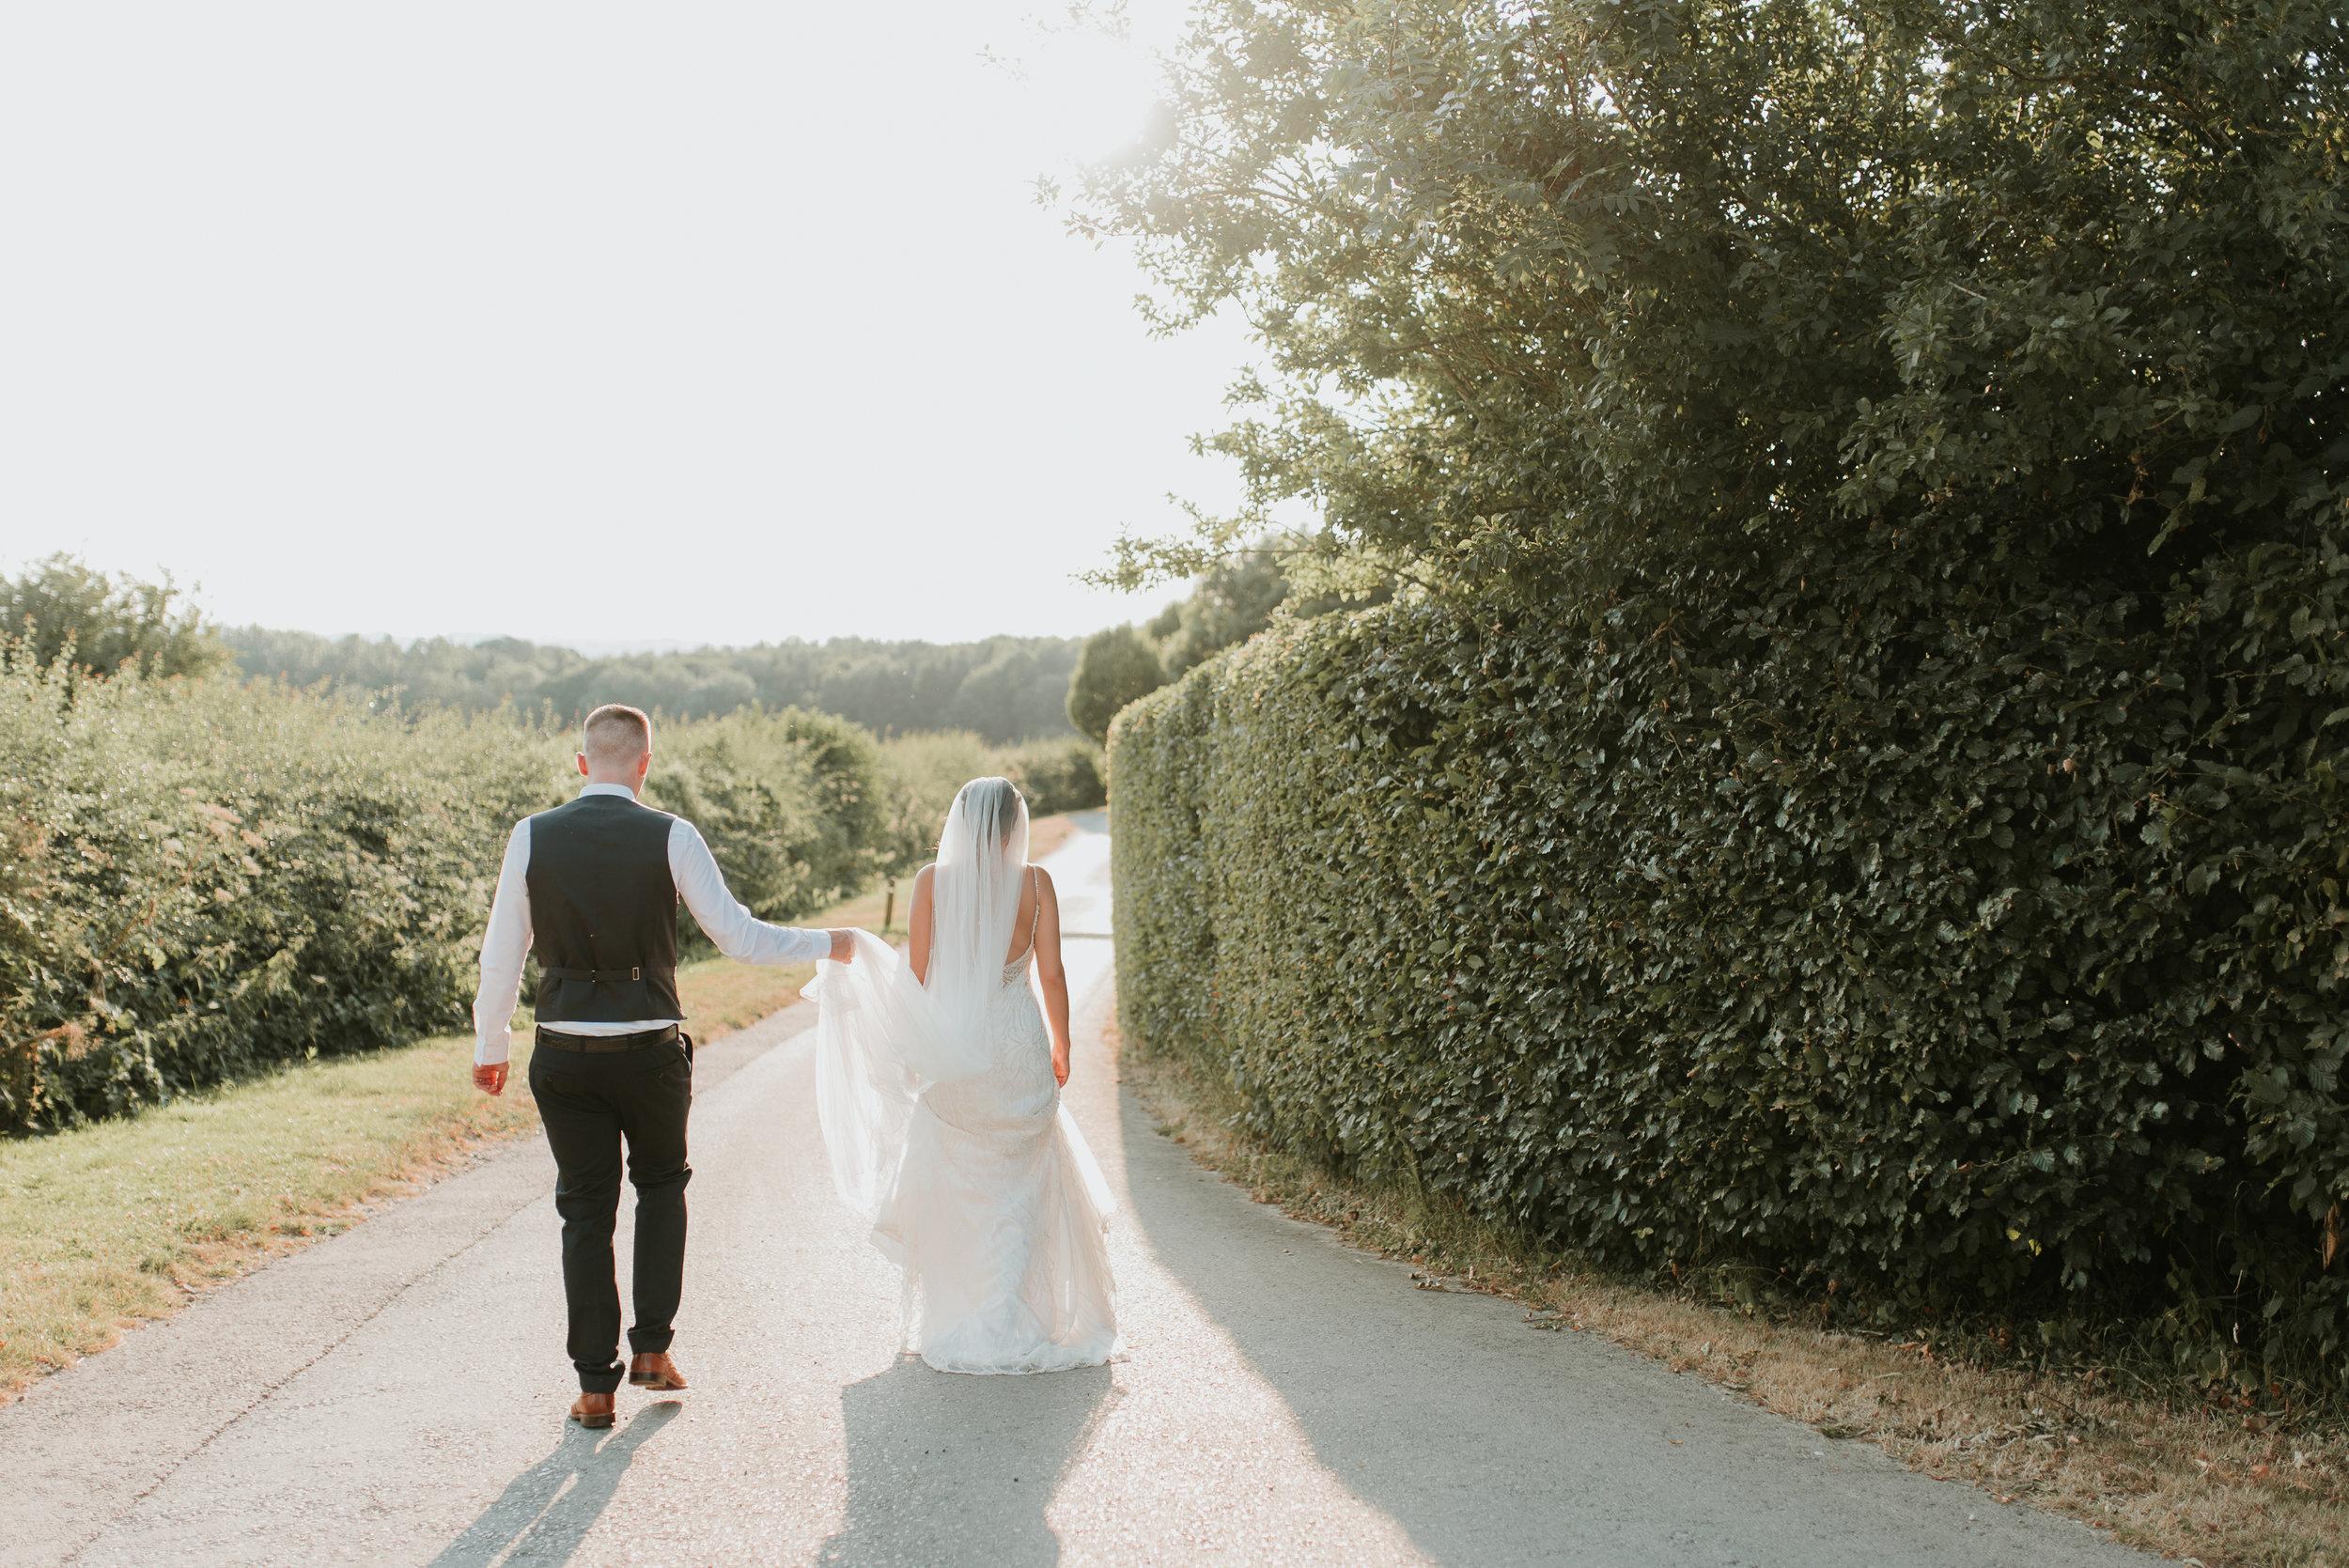 Oxfordshire-wedding-photographer-80.jpg